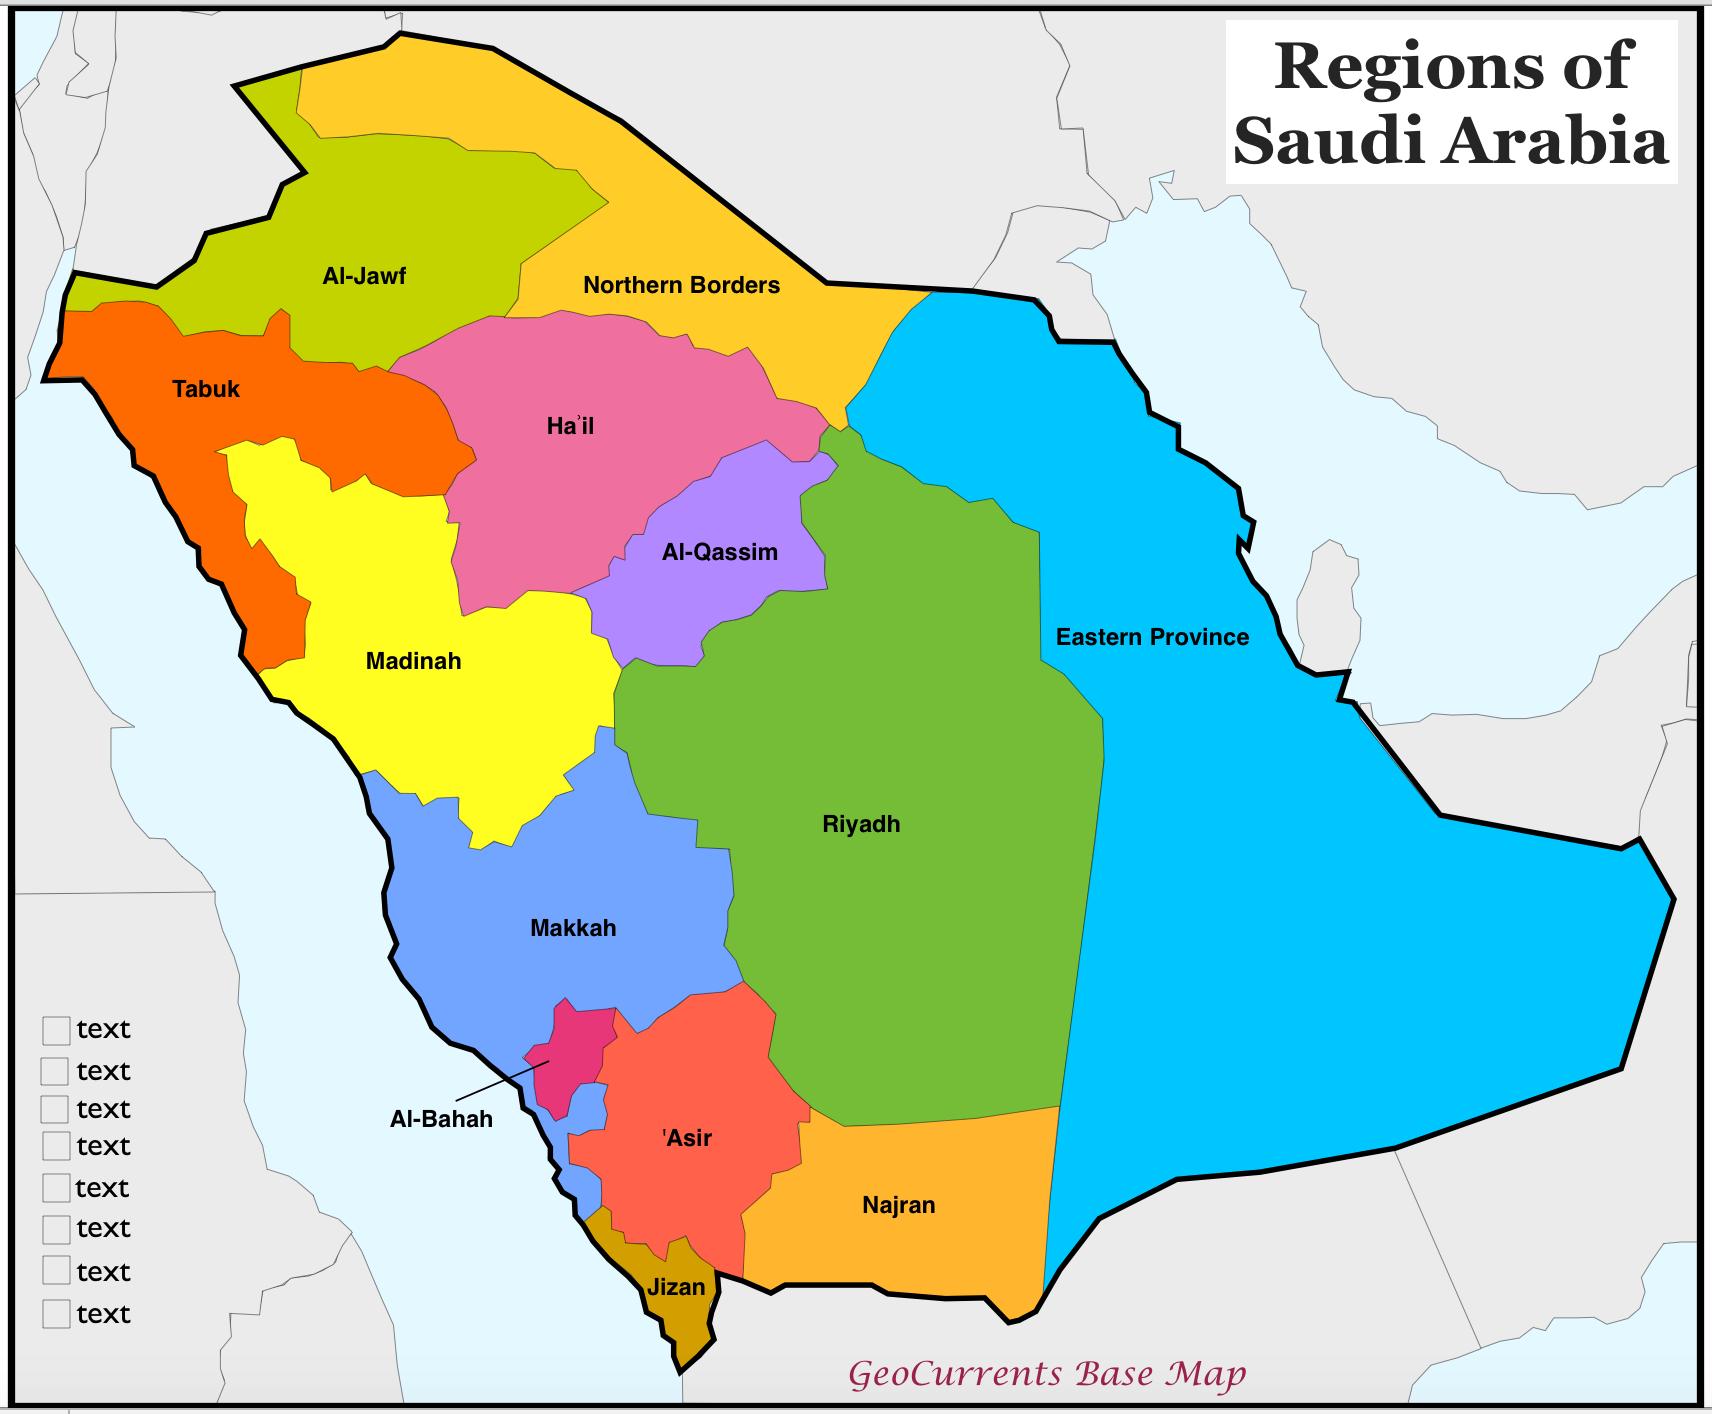 Regions of Saudi Arabia Map - GeoCurrents